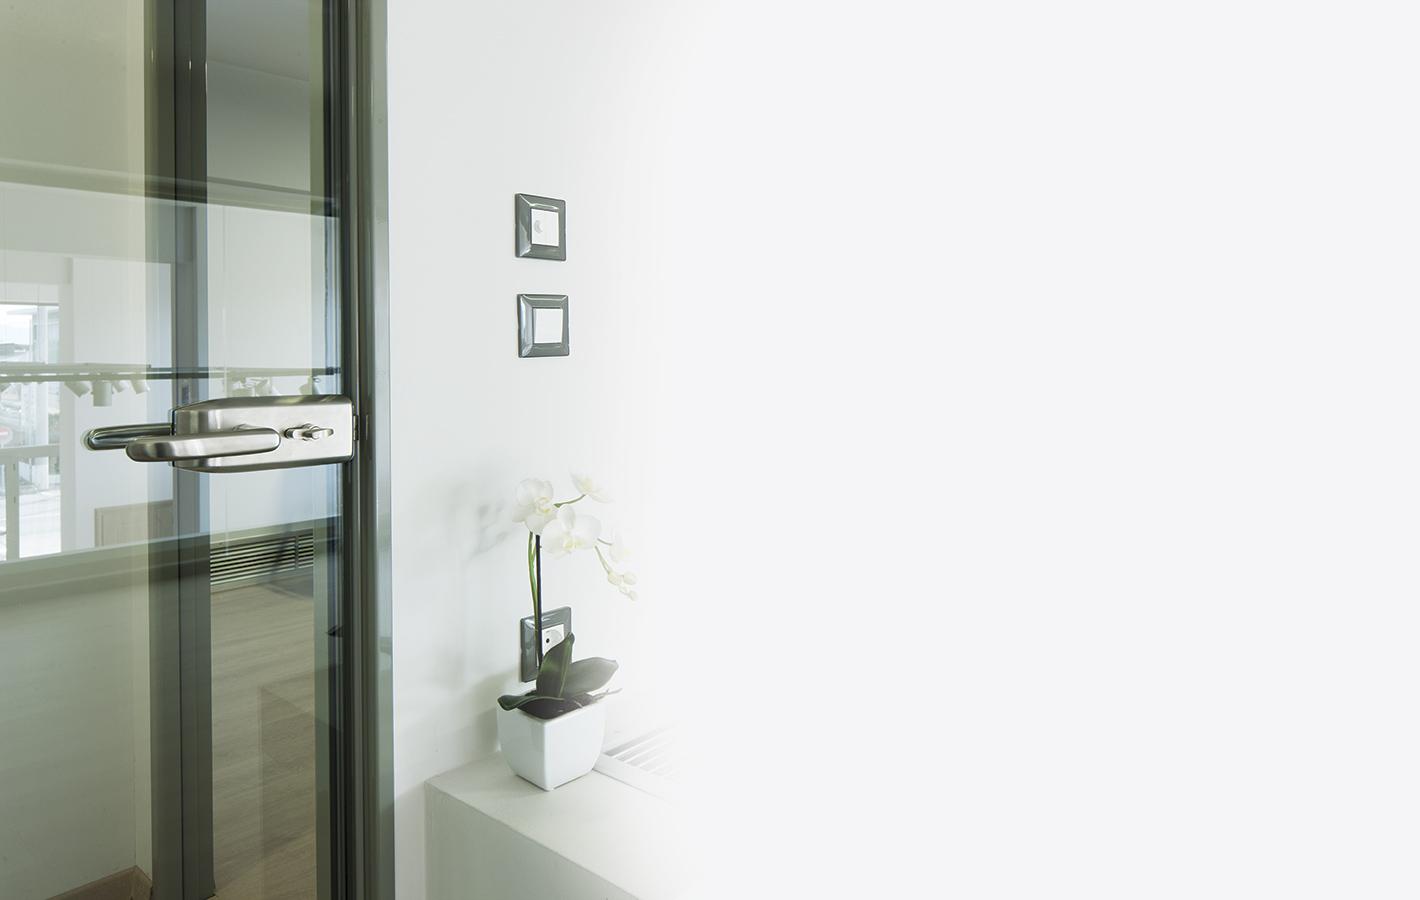 Porta block - Γυάλινες πόρτες